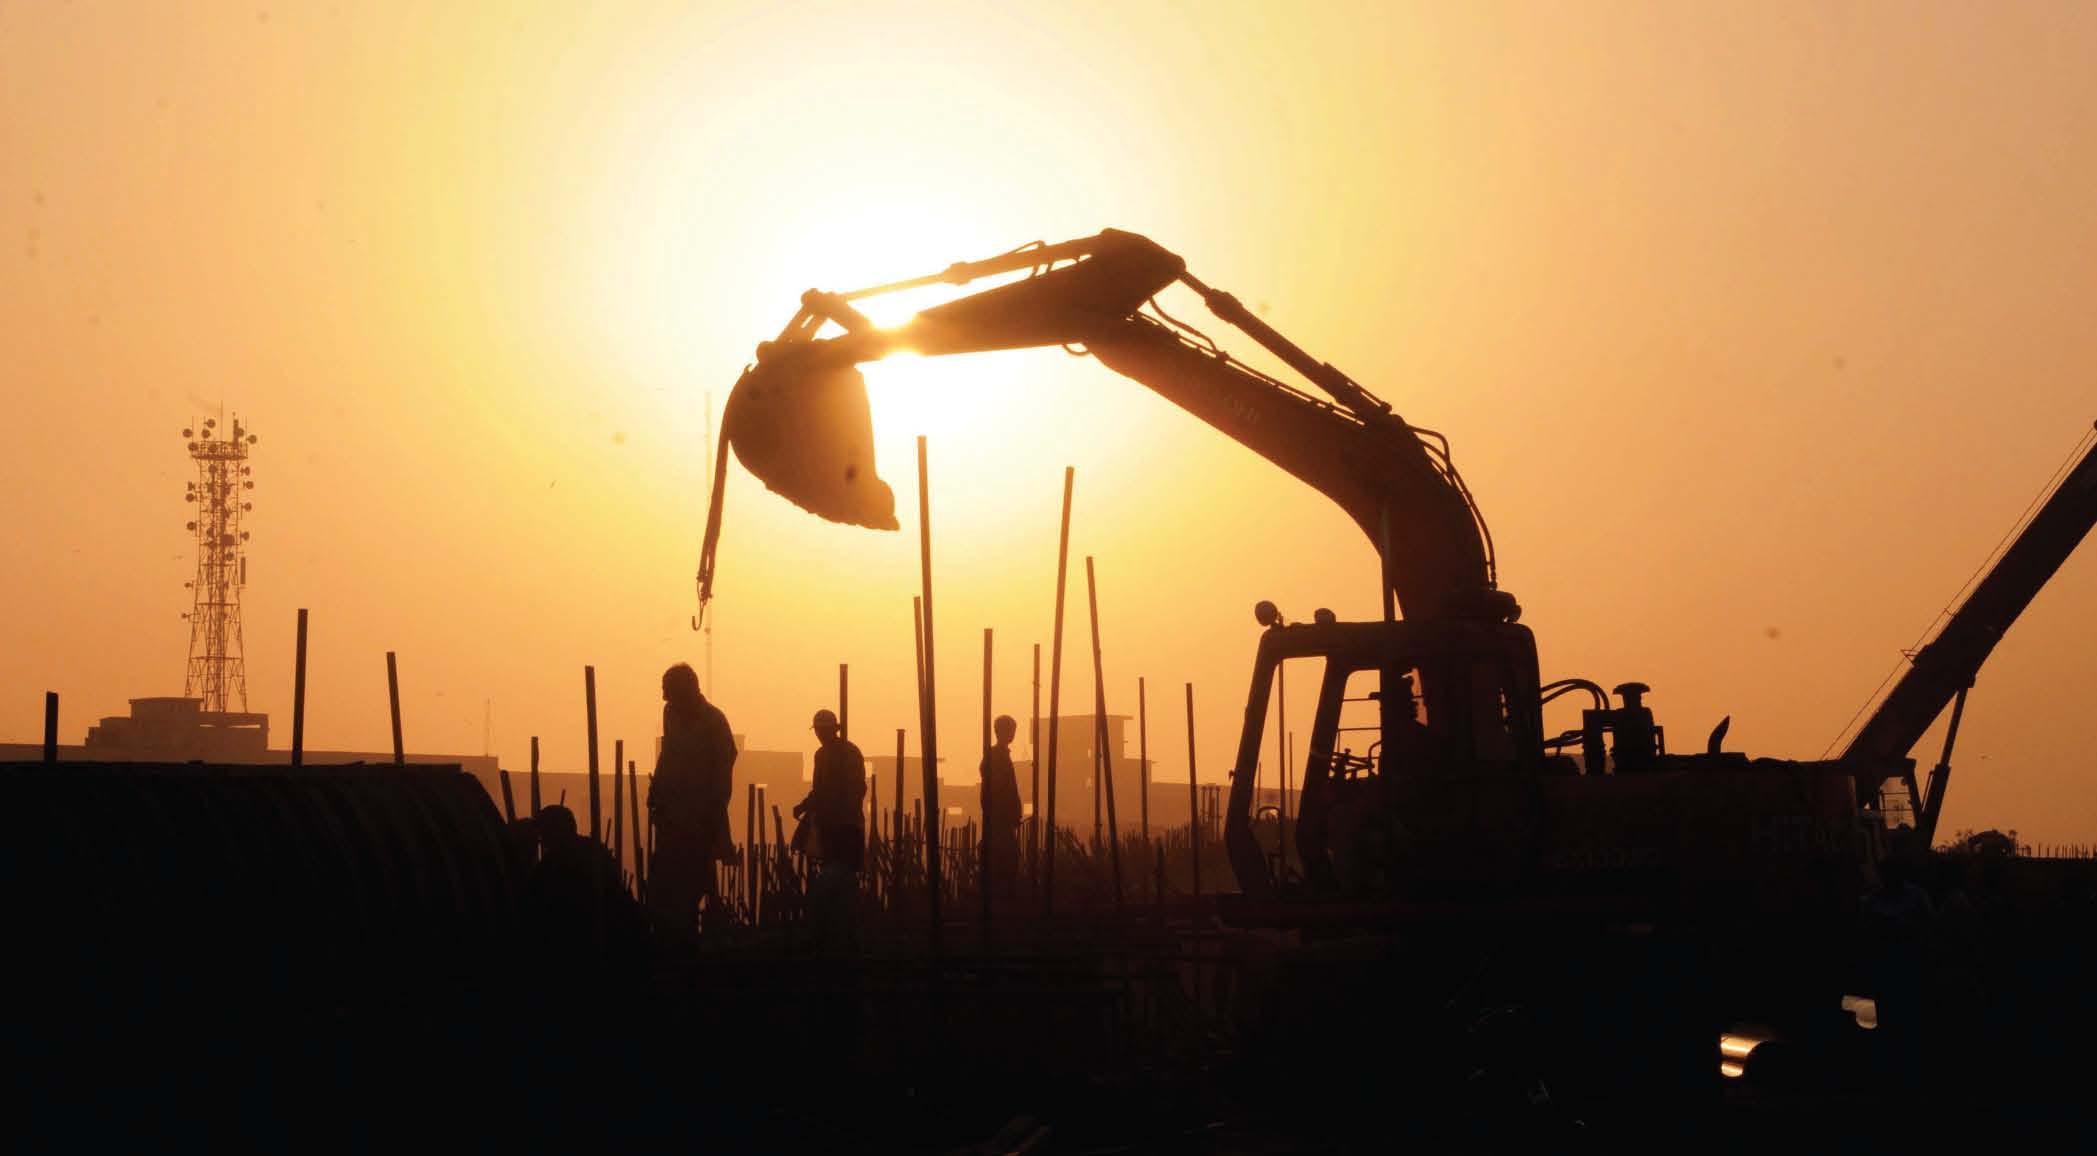 punjab s 5b investment plan insufficient